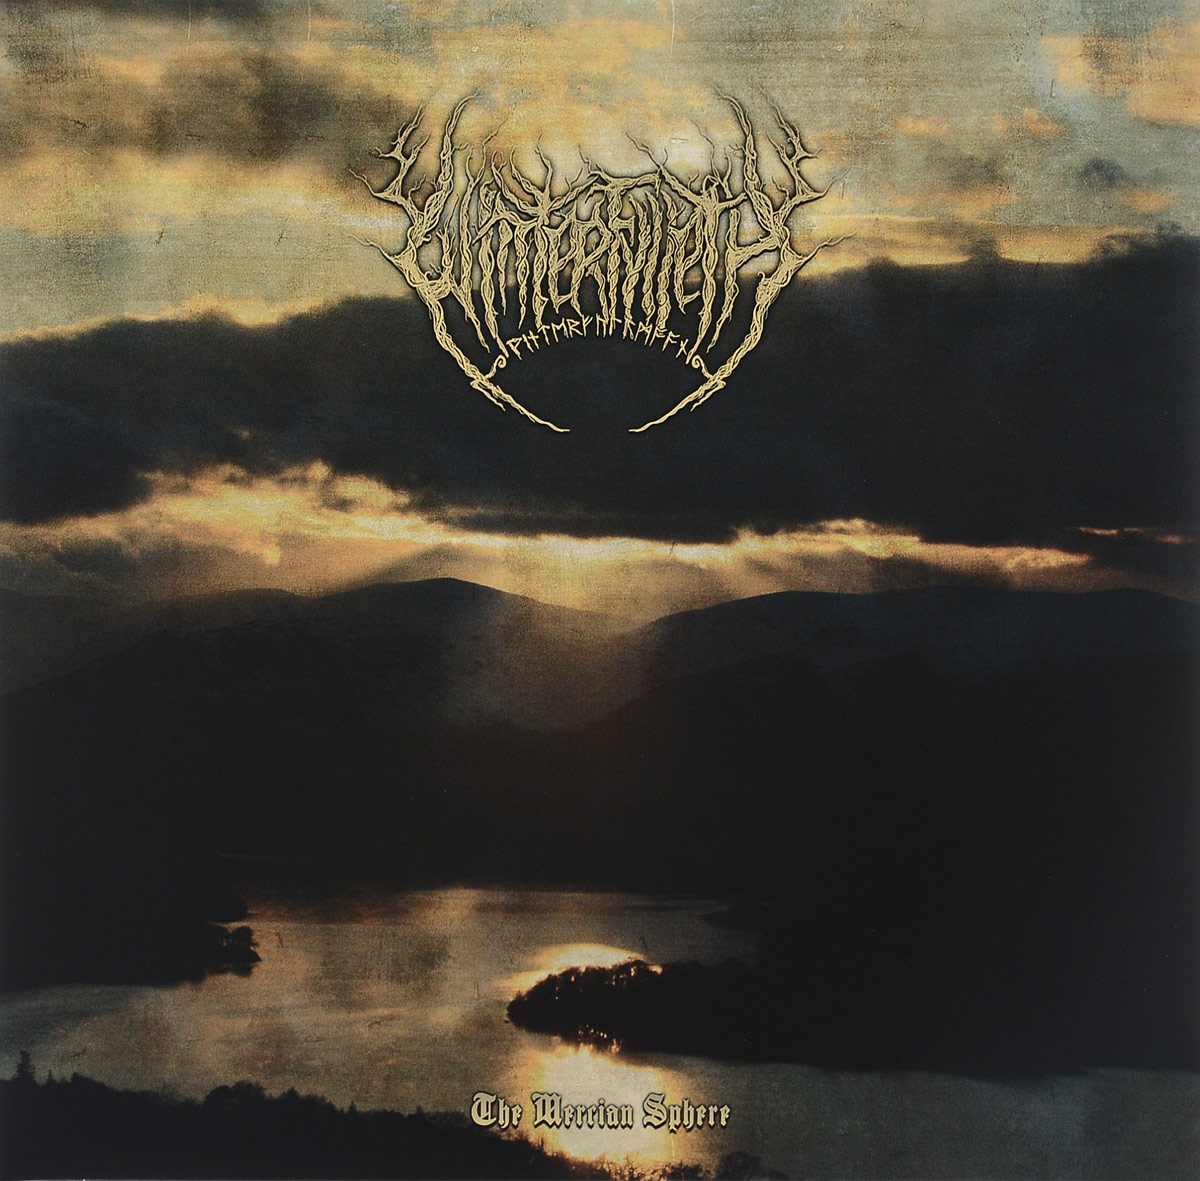 Winterfylleth Winterfylleth. The Mercian Sphere (2 LP)